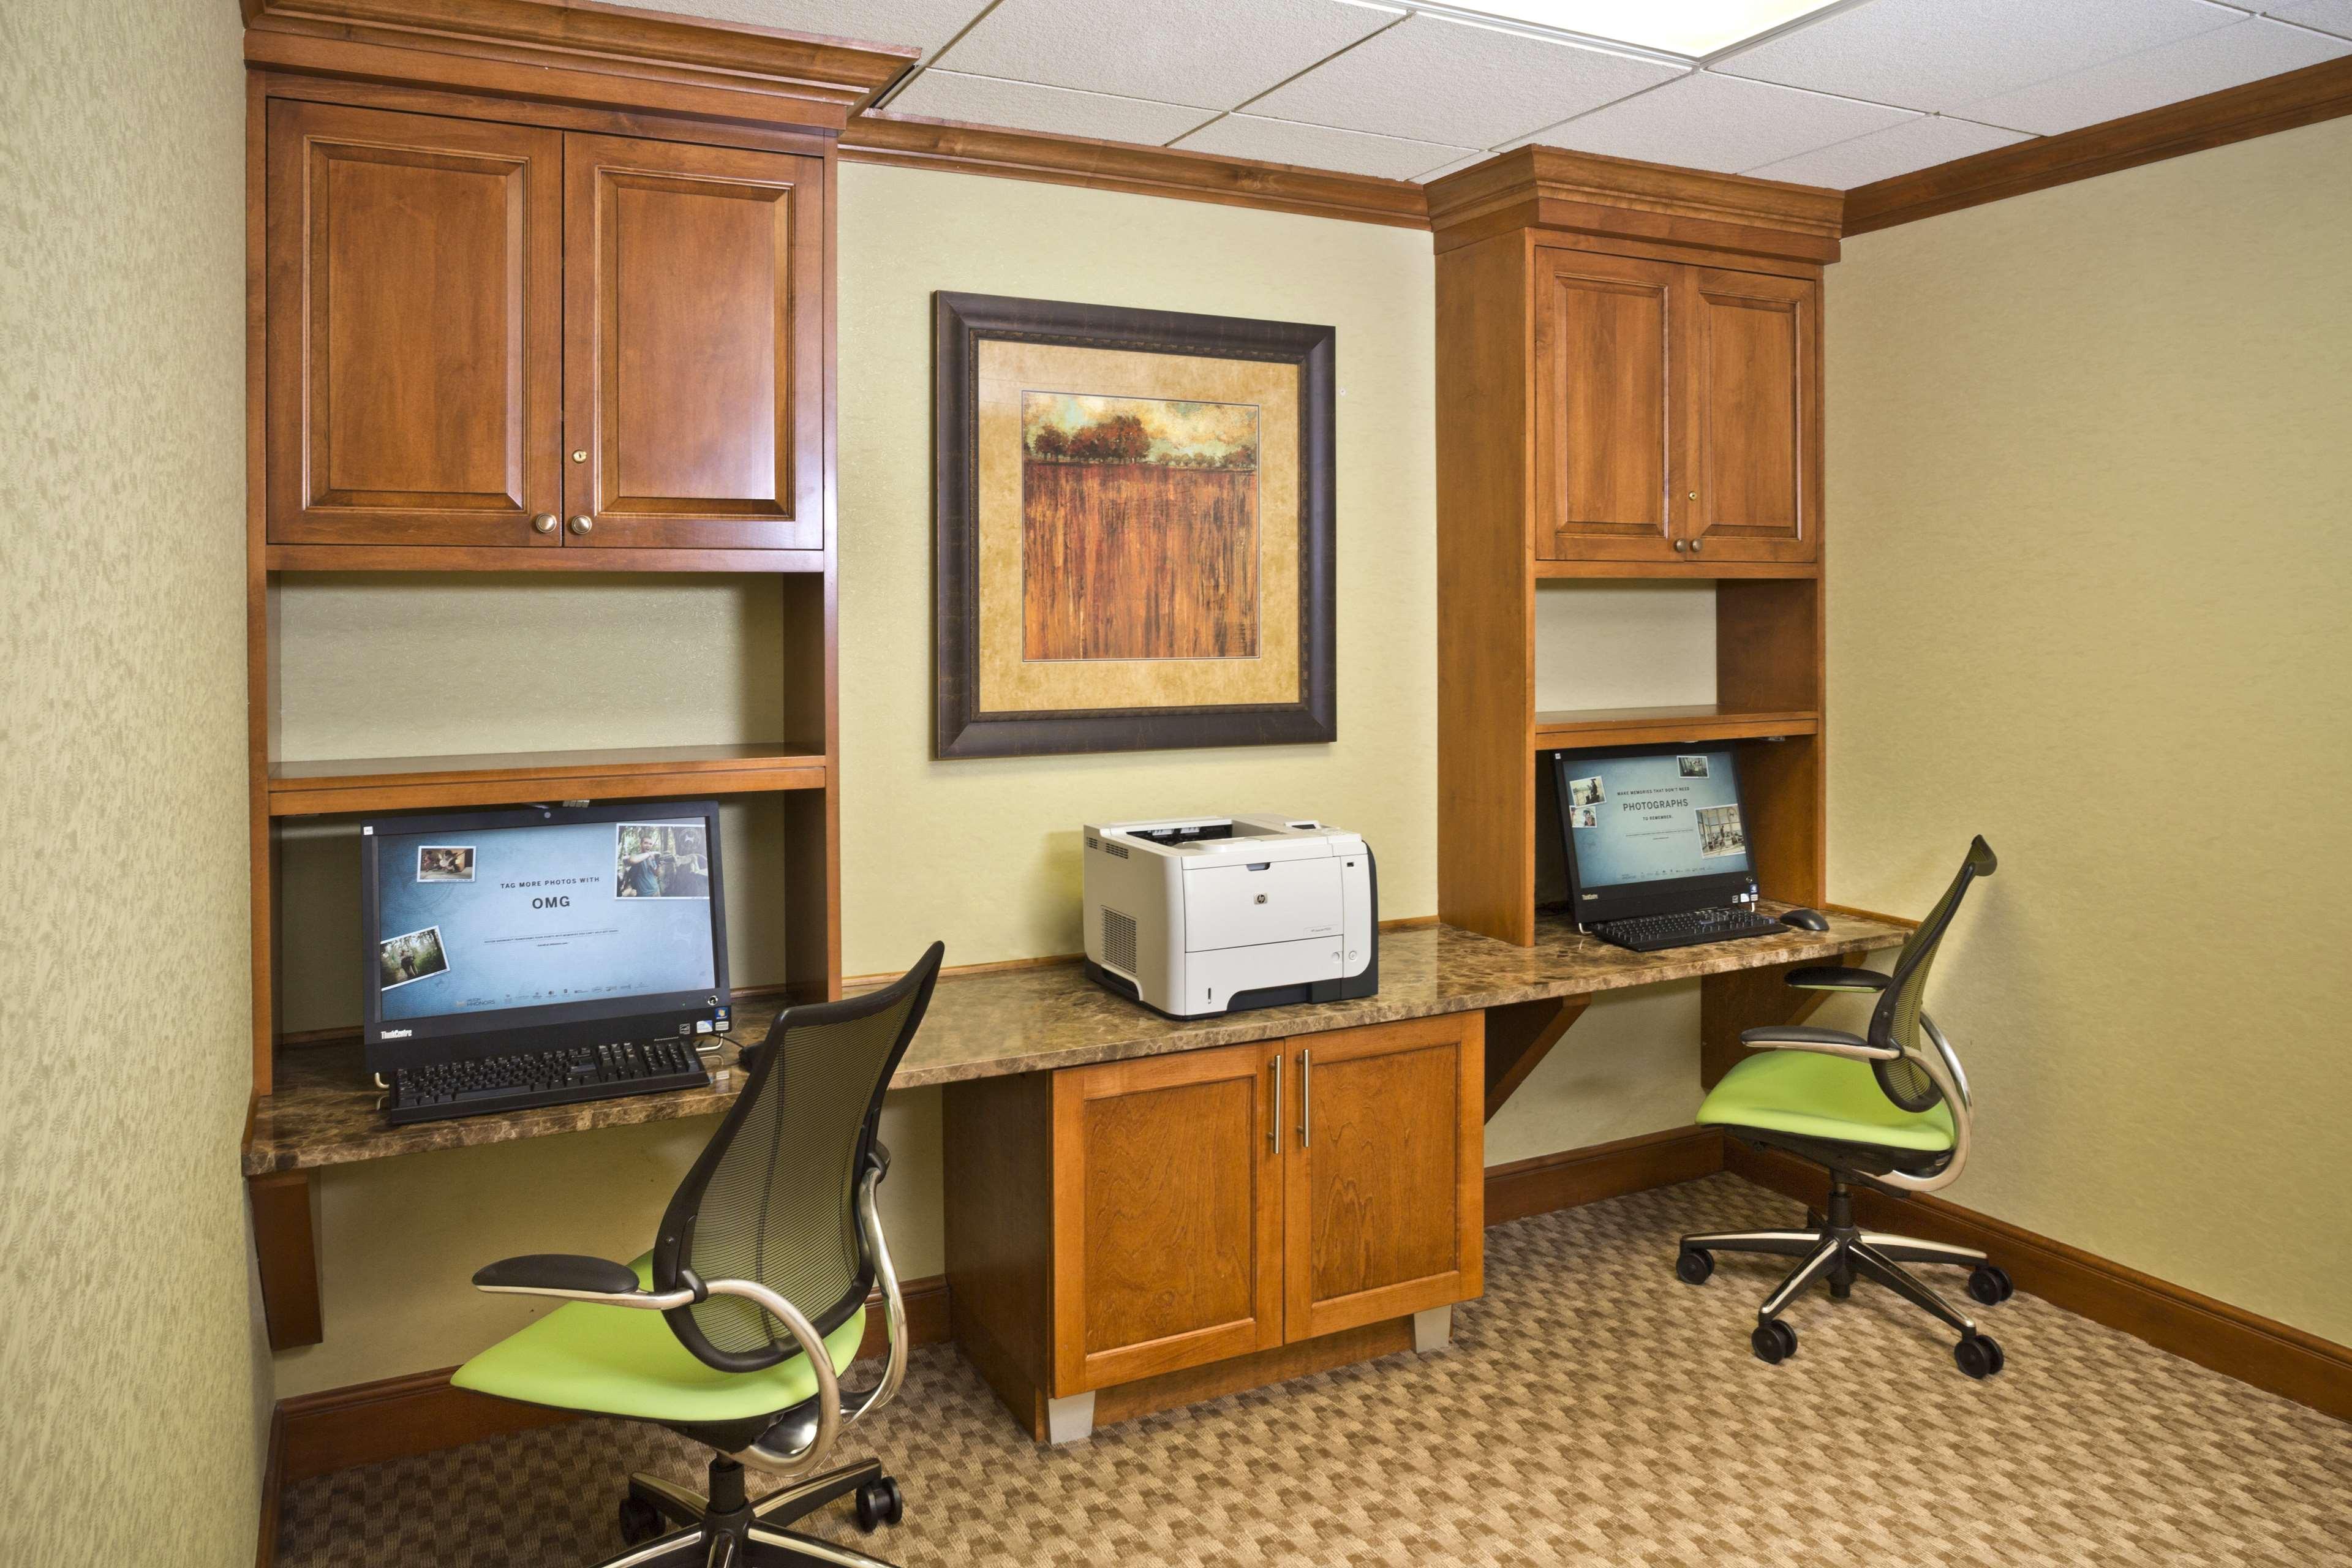 Hampton Inn & Suites Arundel Mills/Baltimore image 22